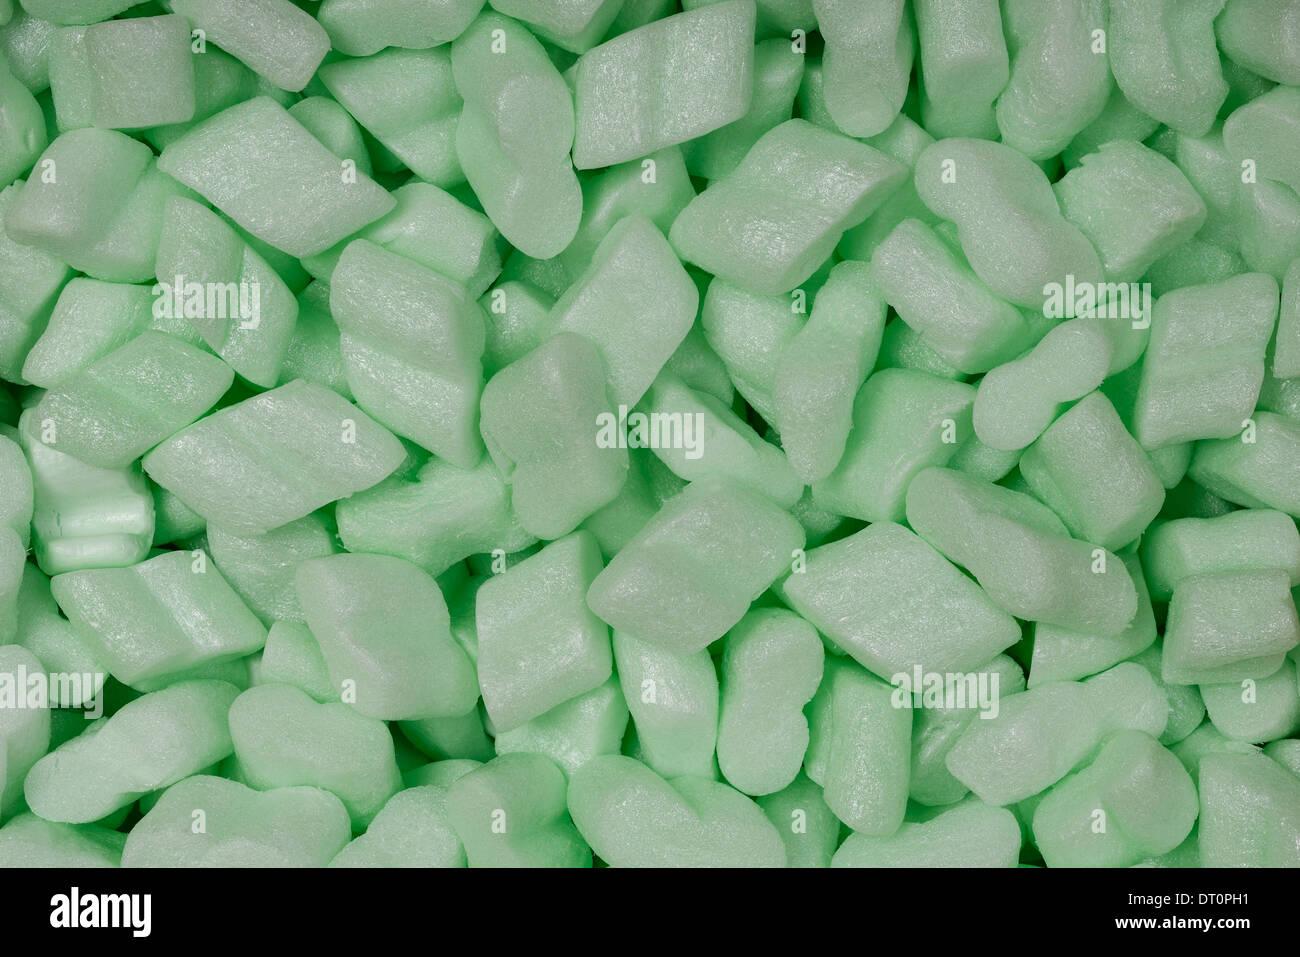 L'amidon de maïs vert matériel emballage arachides Photo Stock